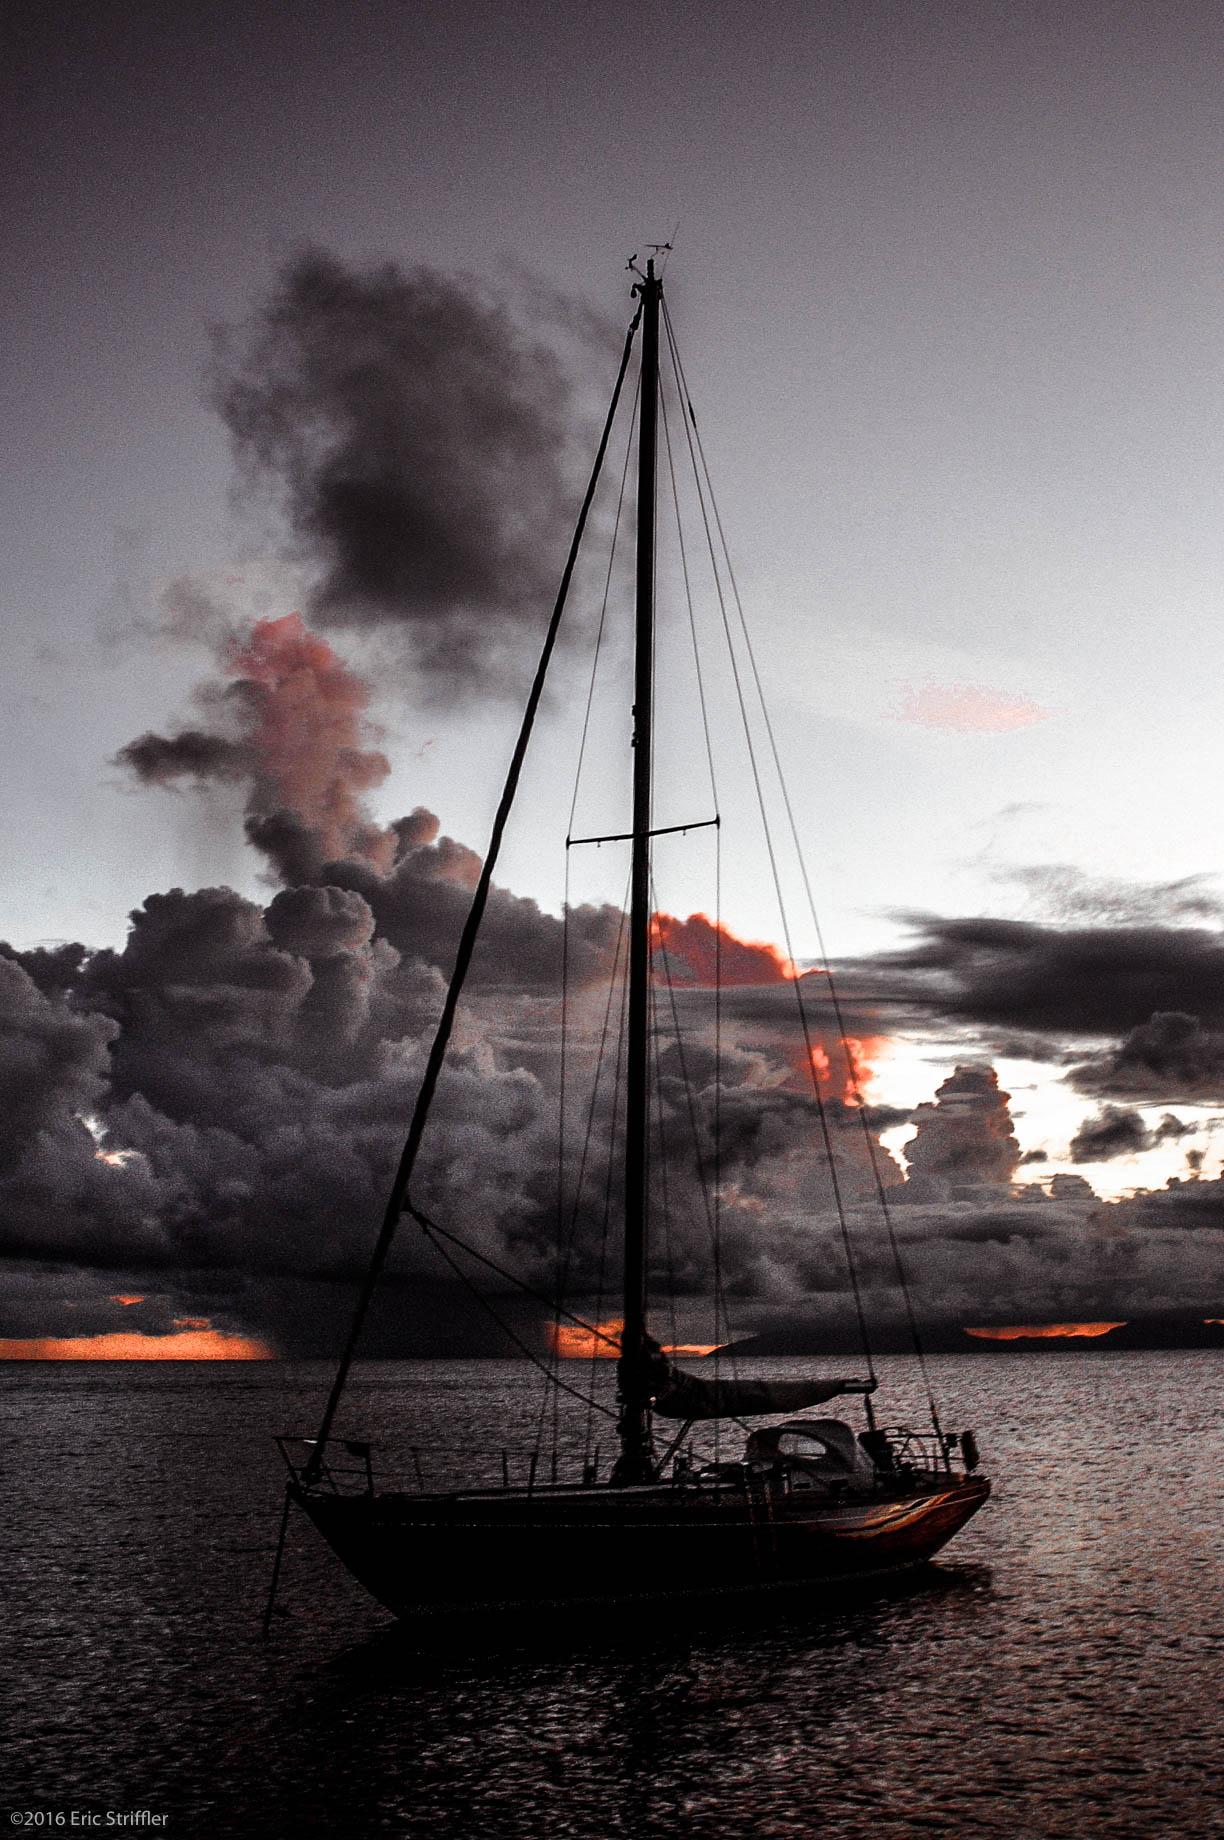 eric_striffler_photography_travel-202.jpg